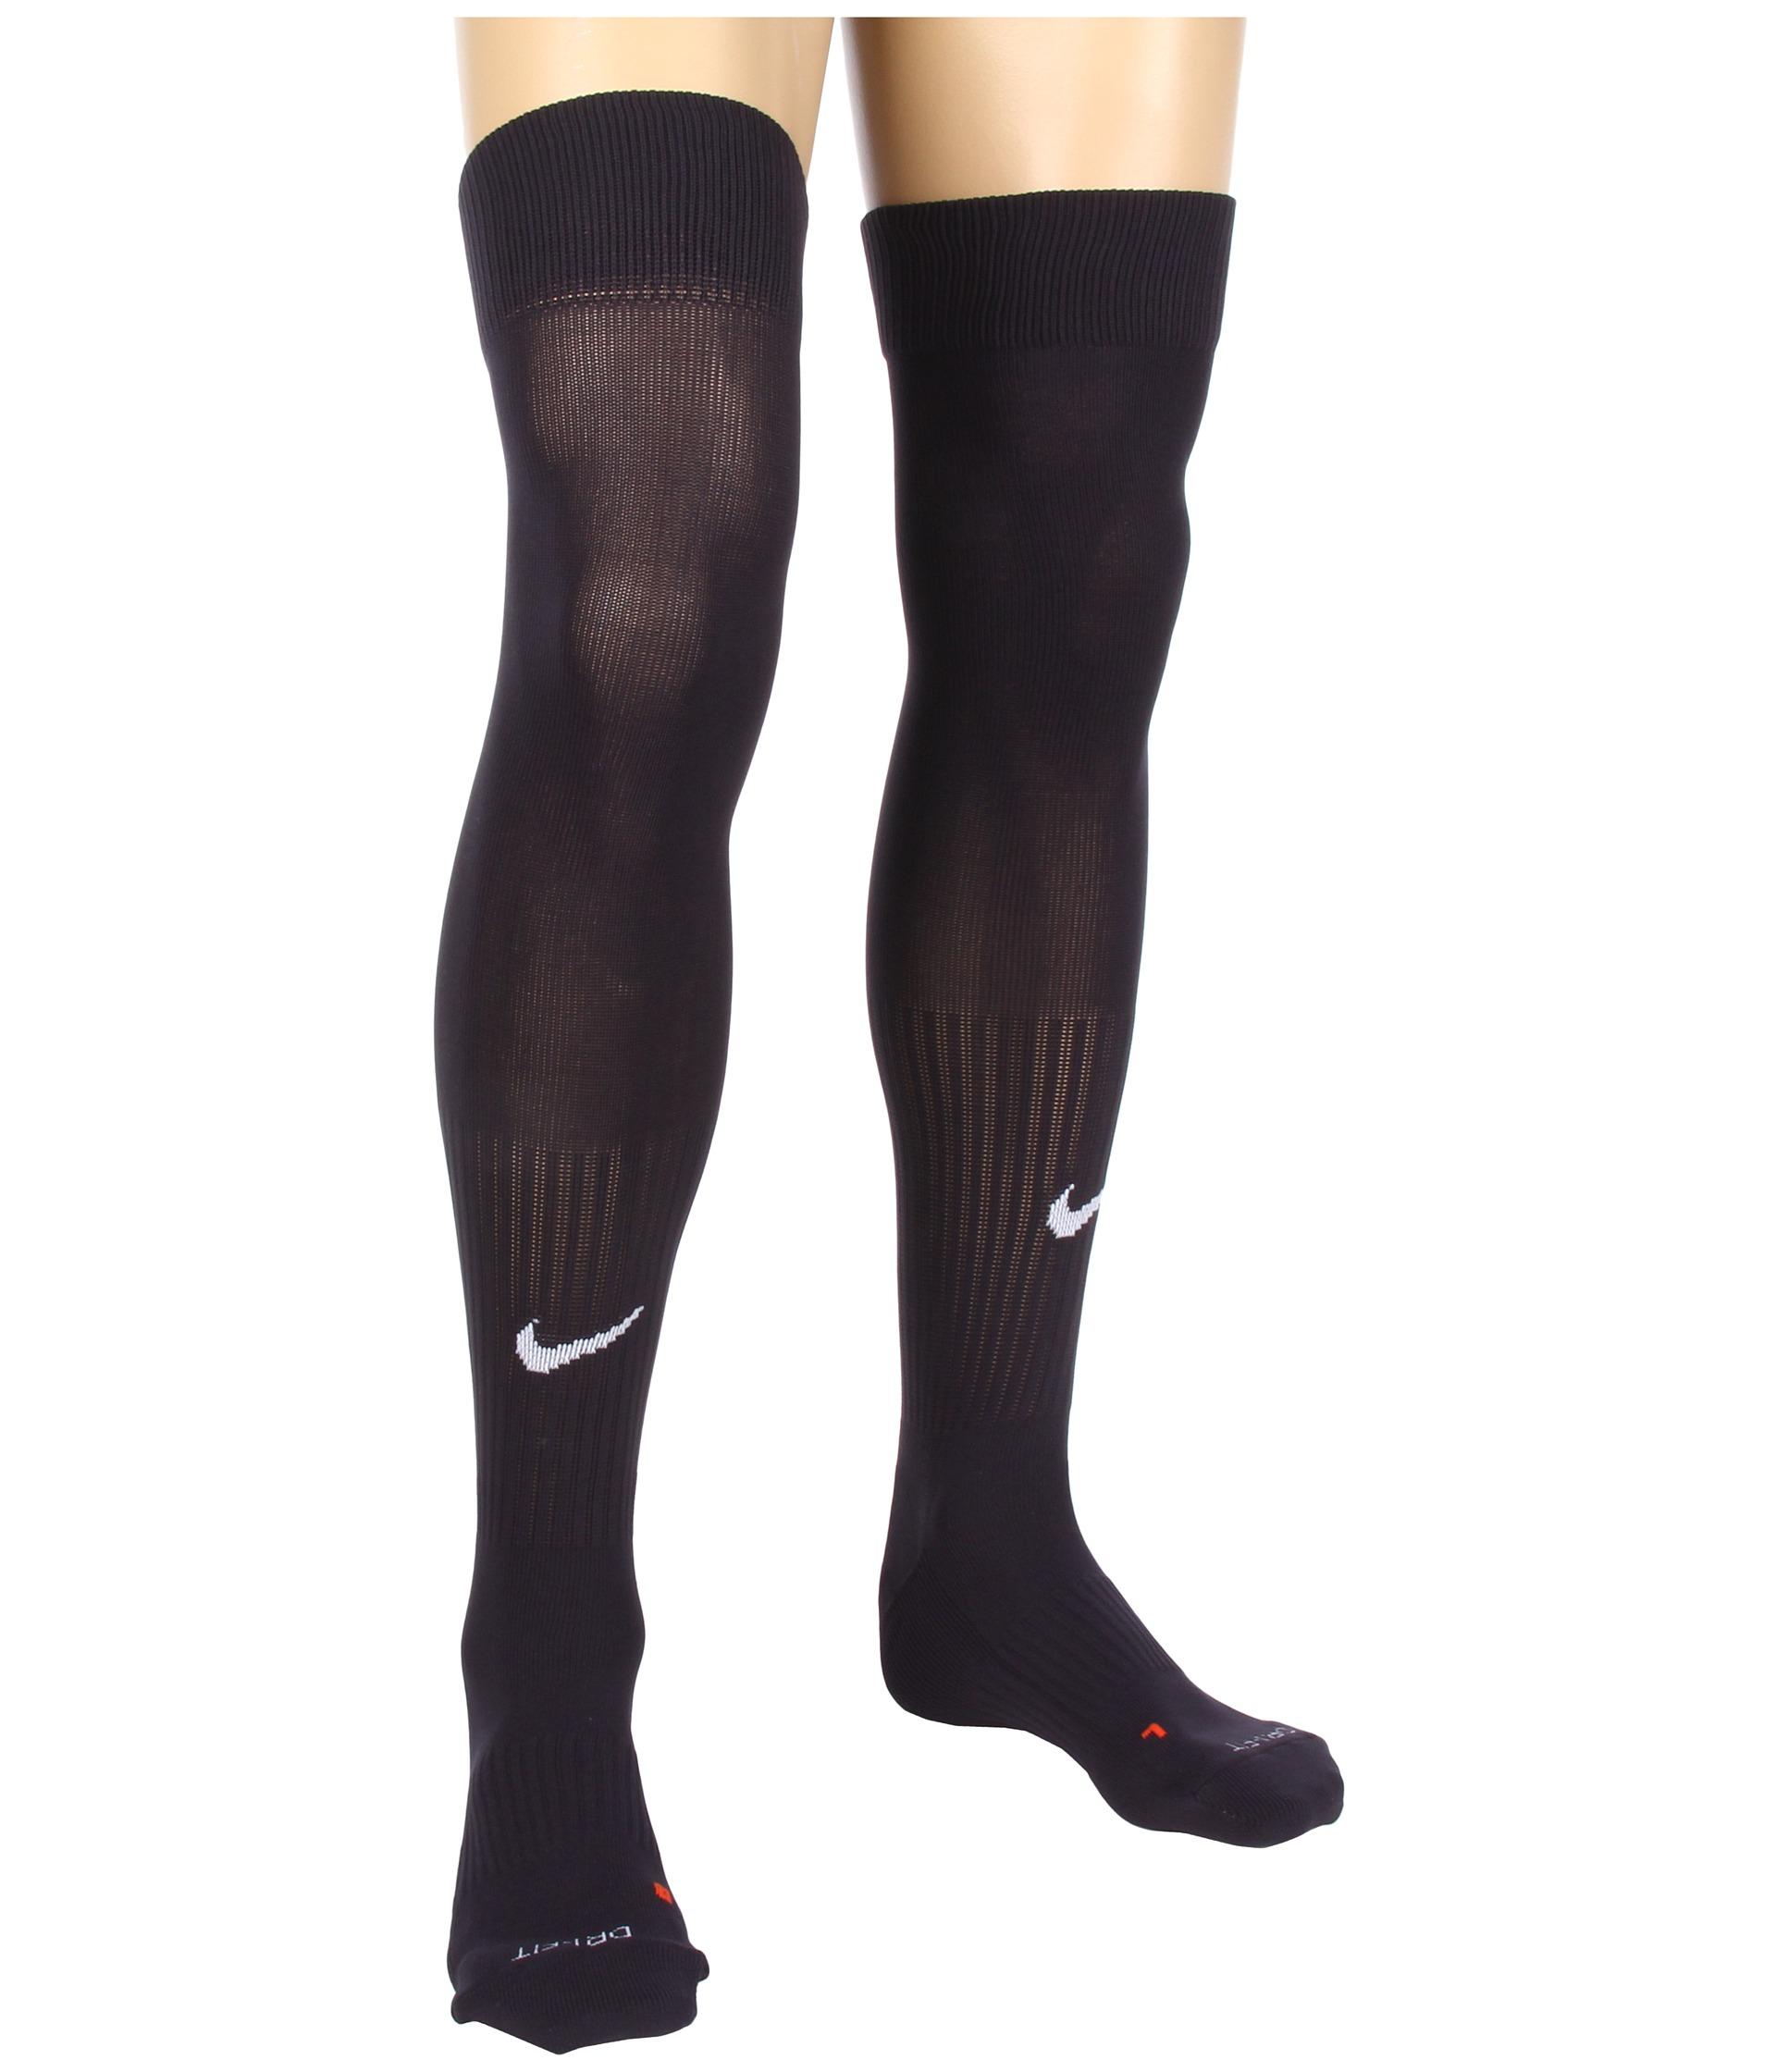 60e34e6e5c8 Nike Nike Soccer Classic Sock Zappos Free Shipping BOTH Ways